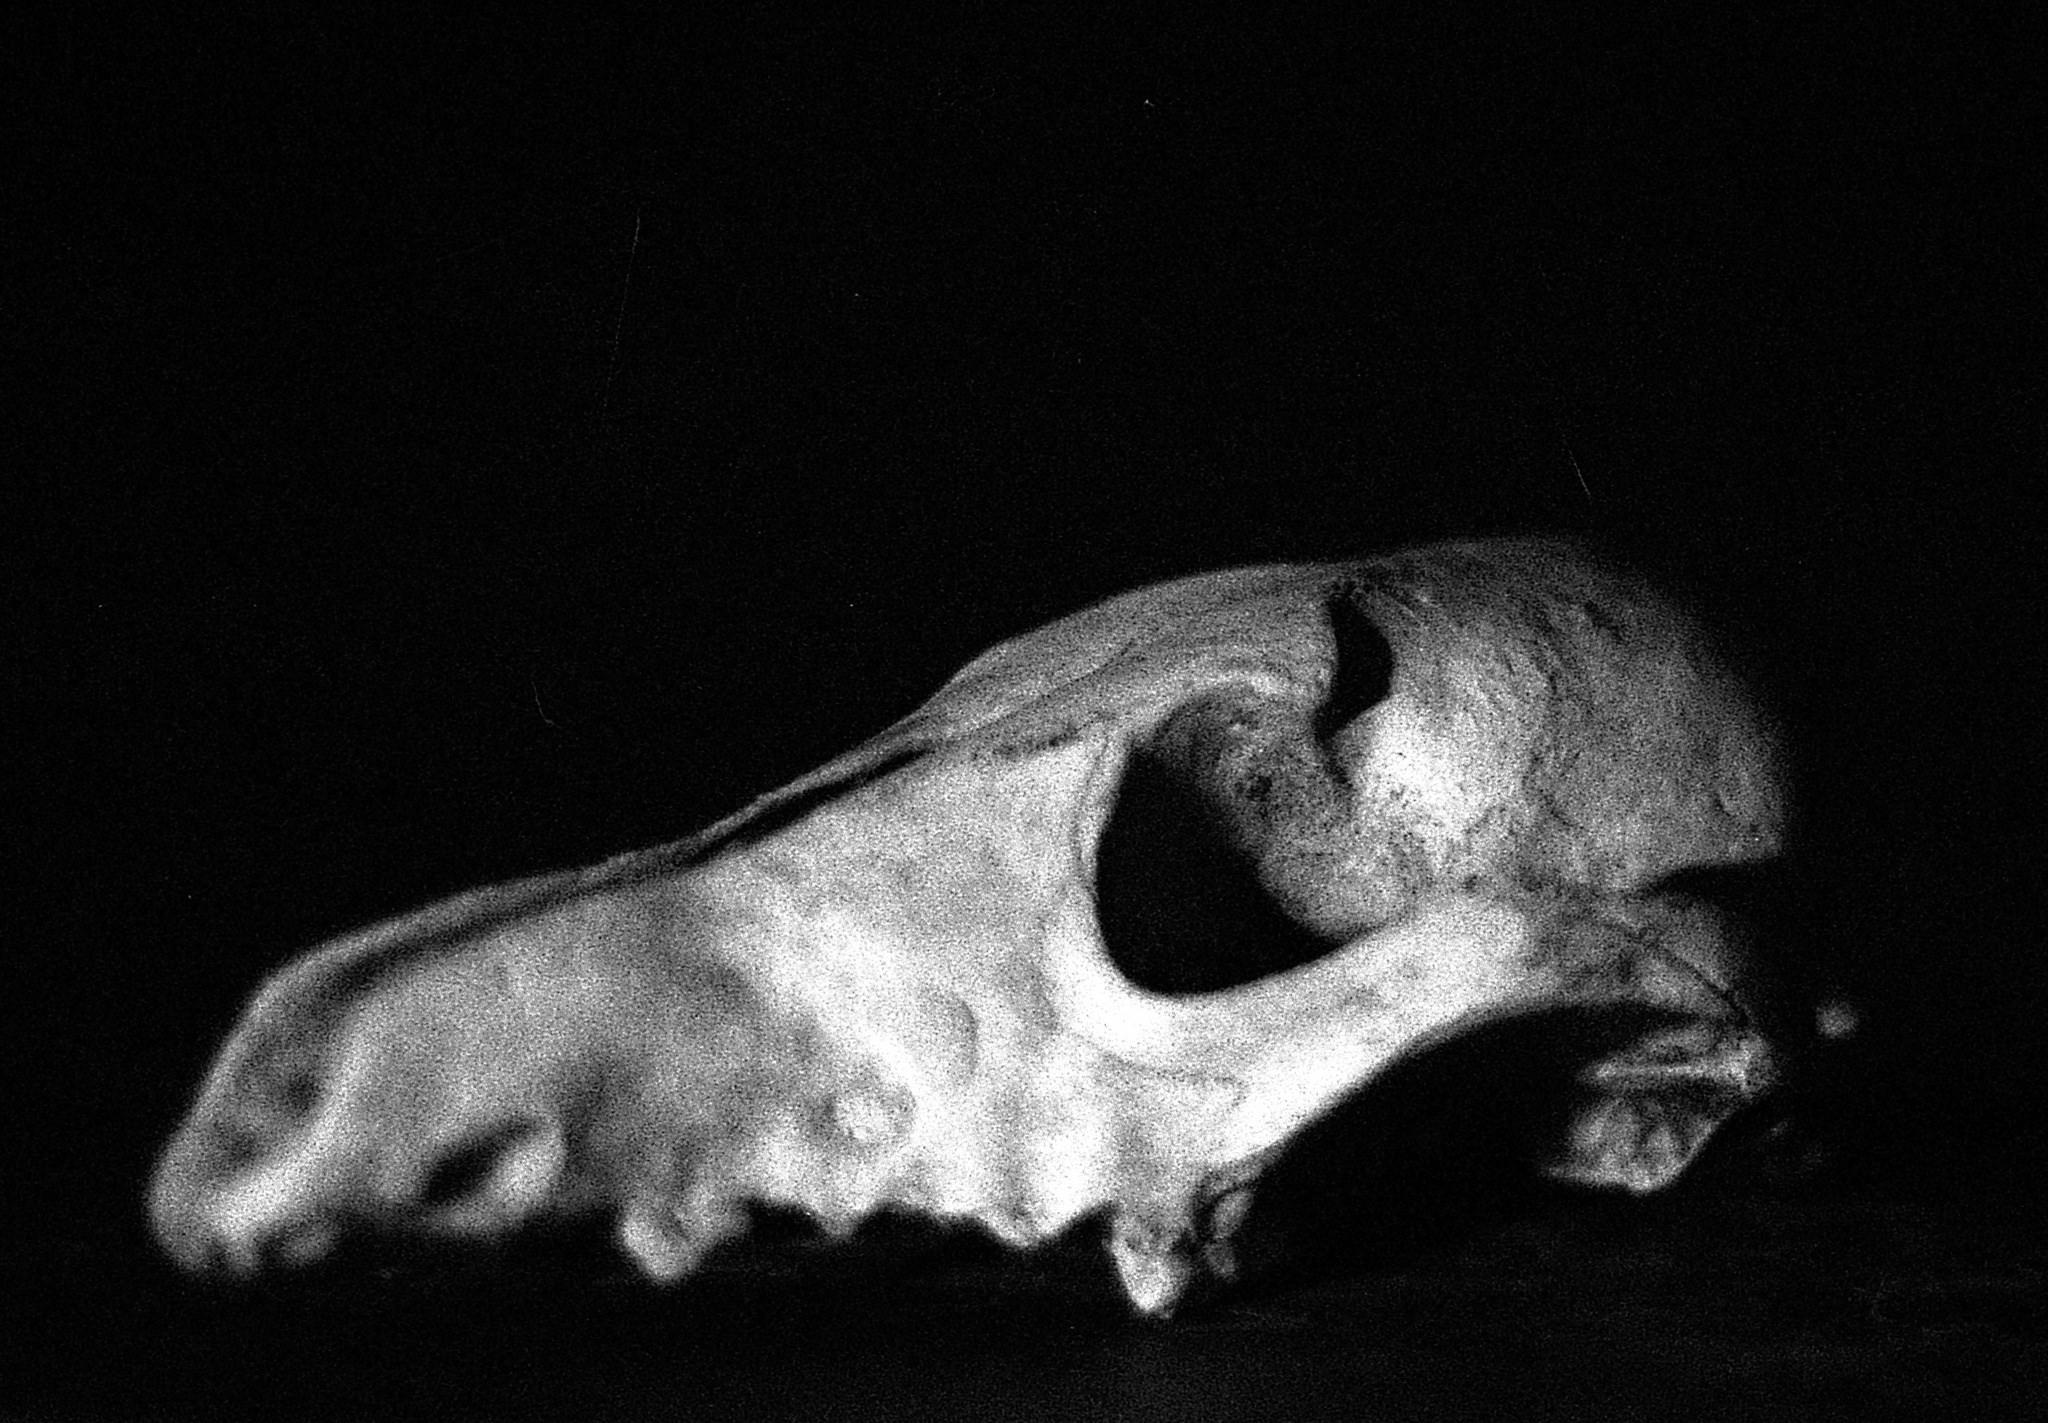 File:Coyote Skull in B&W jpg - Wikimedia Commons